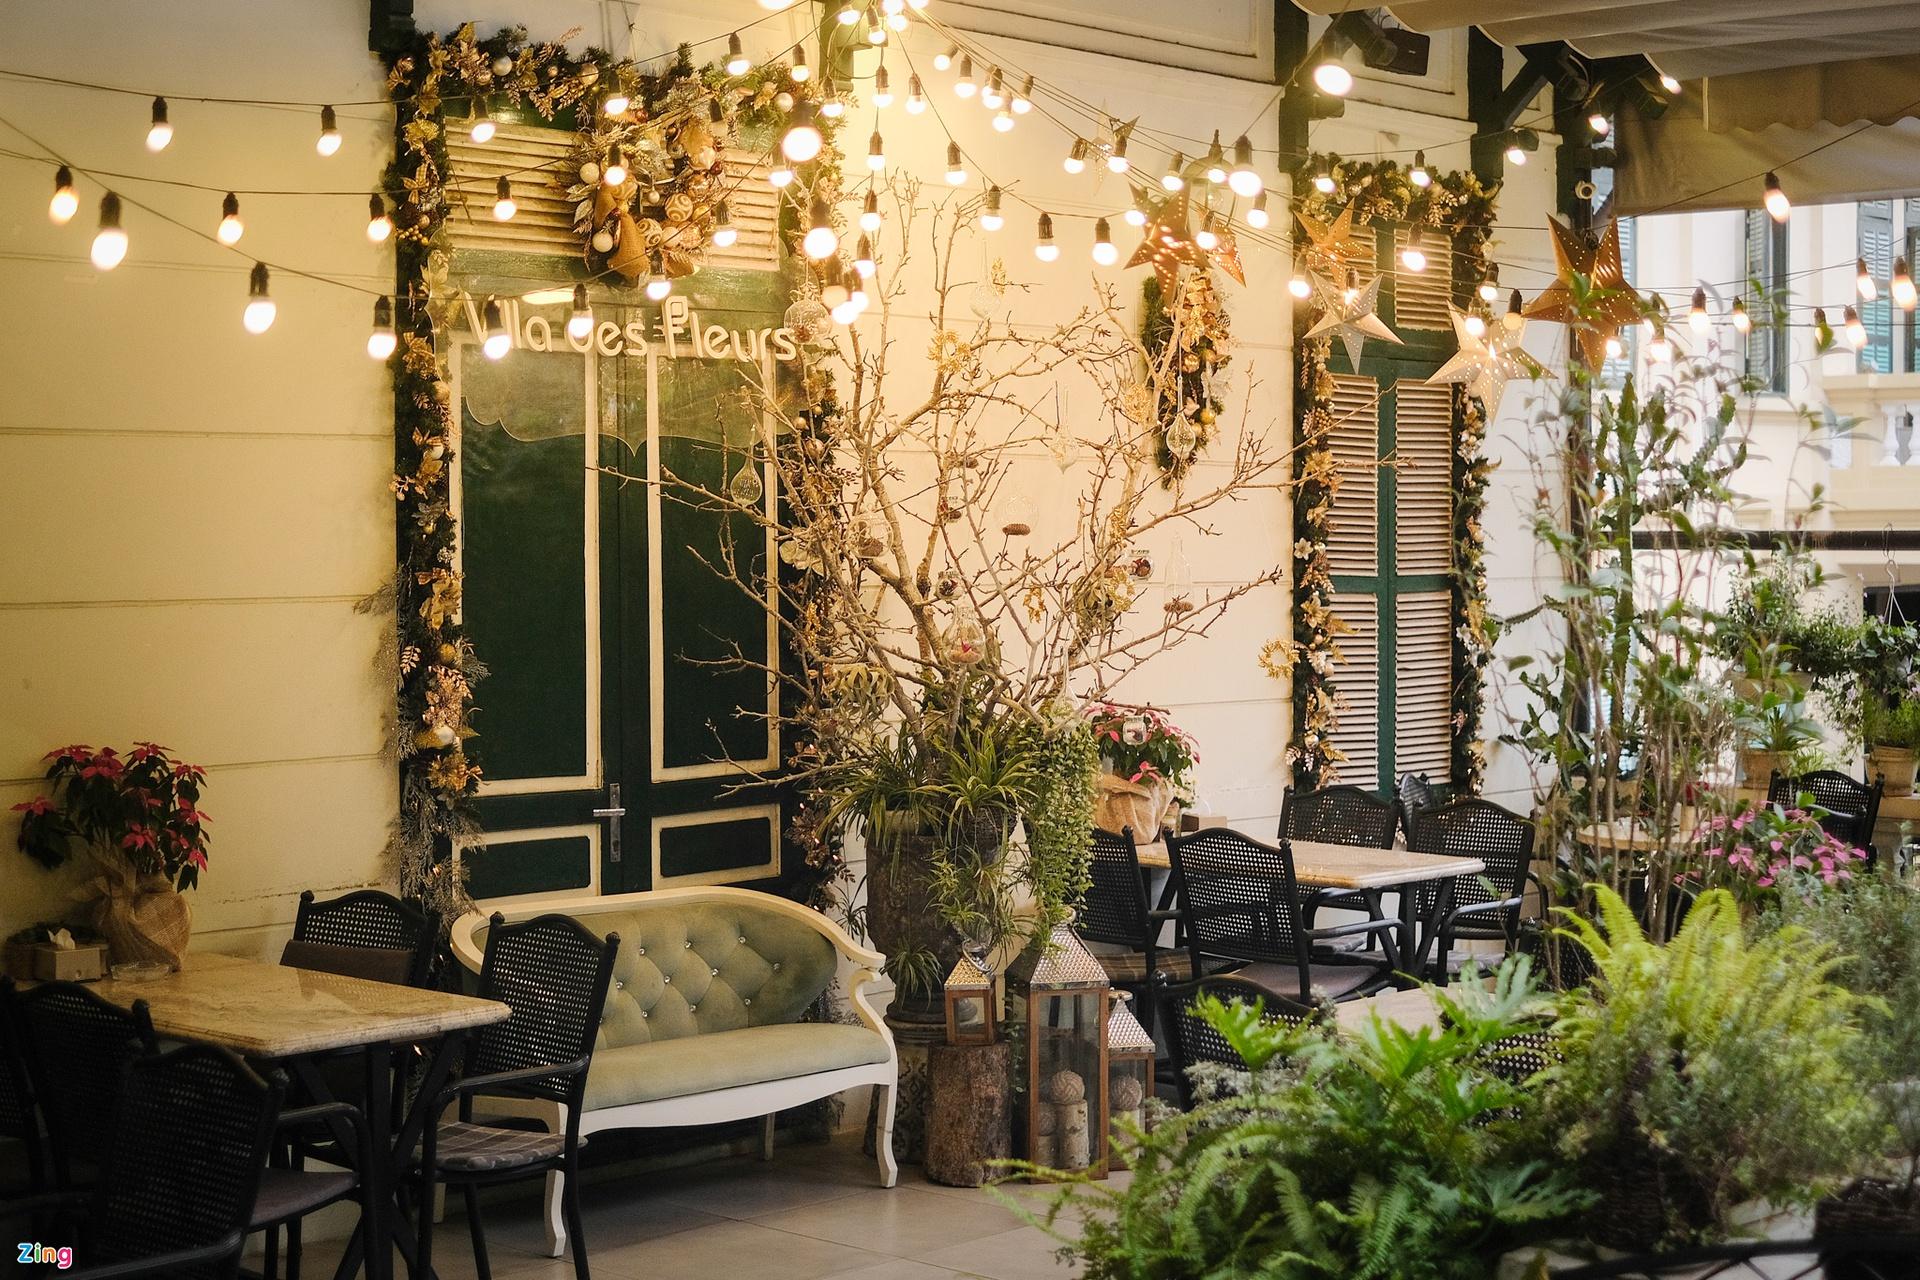 Three coffee shops in Hanoi to take Christmassy photos